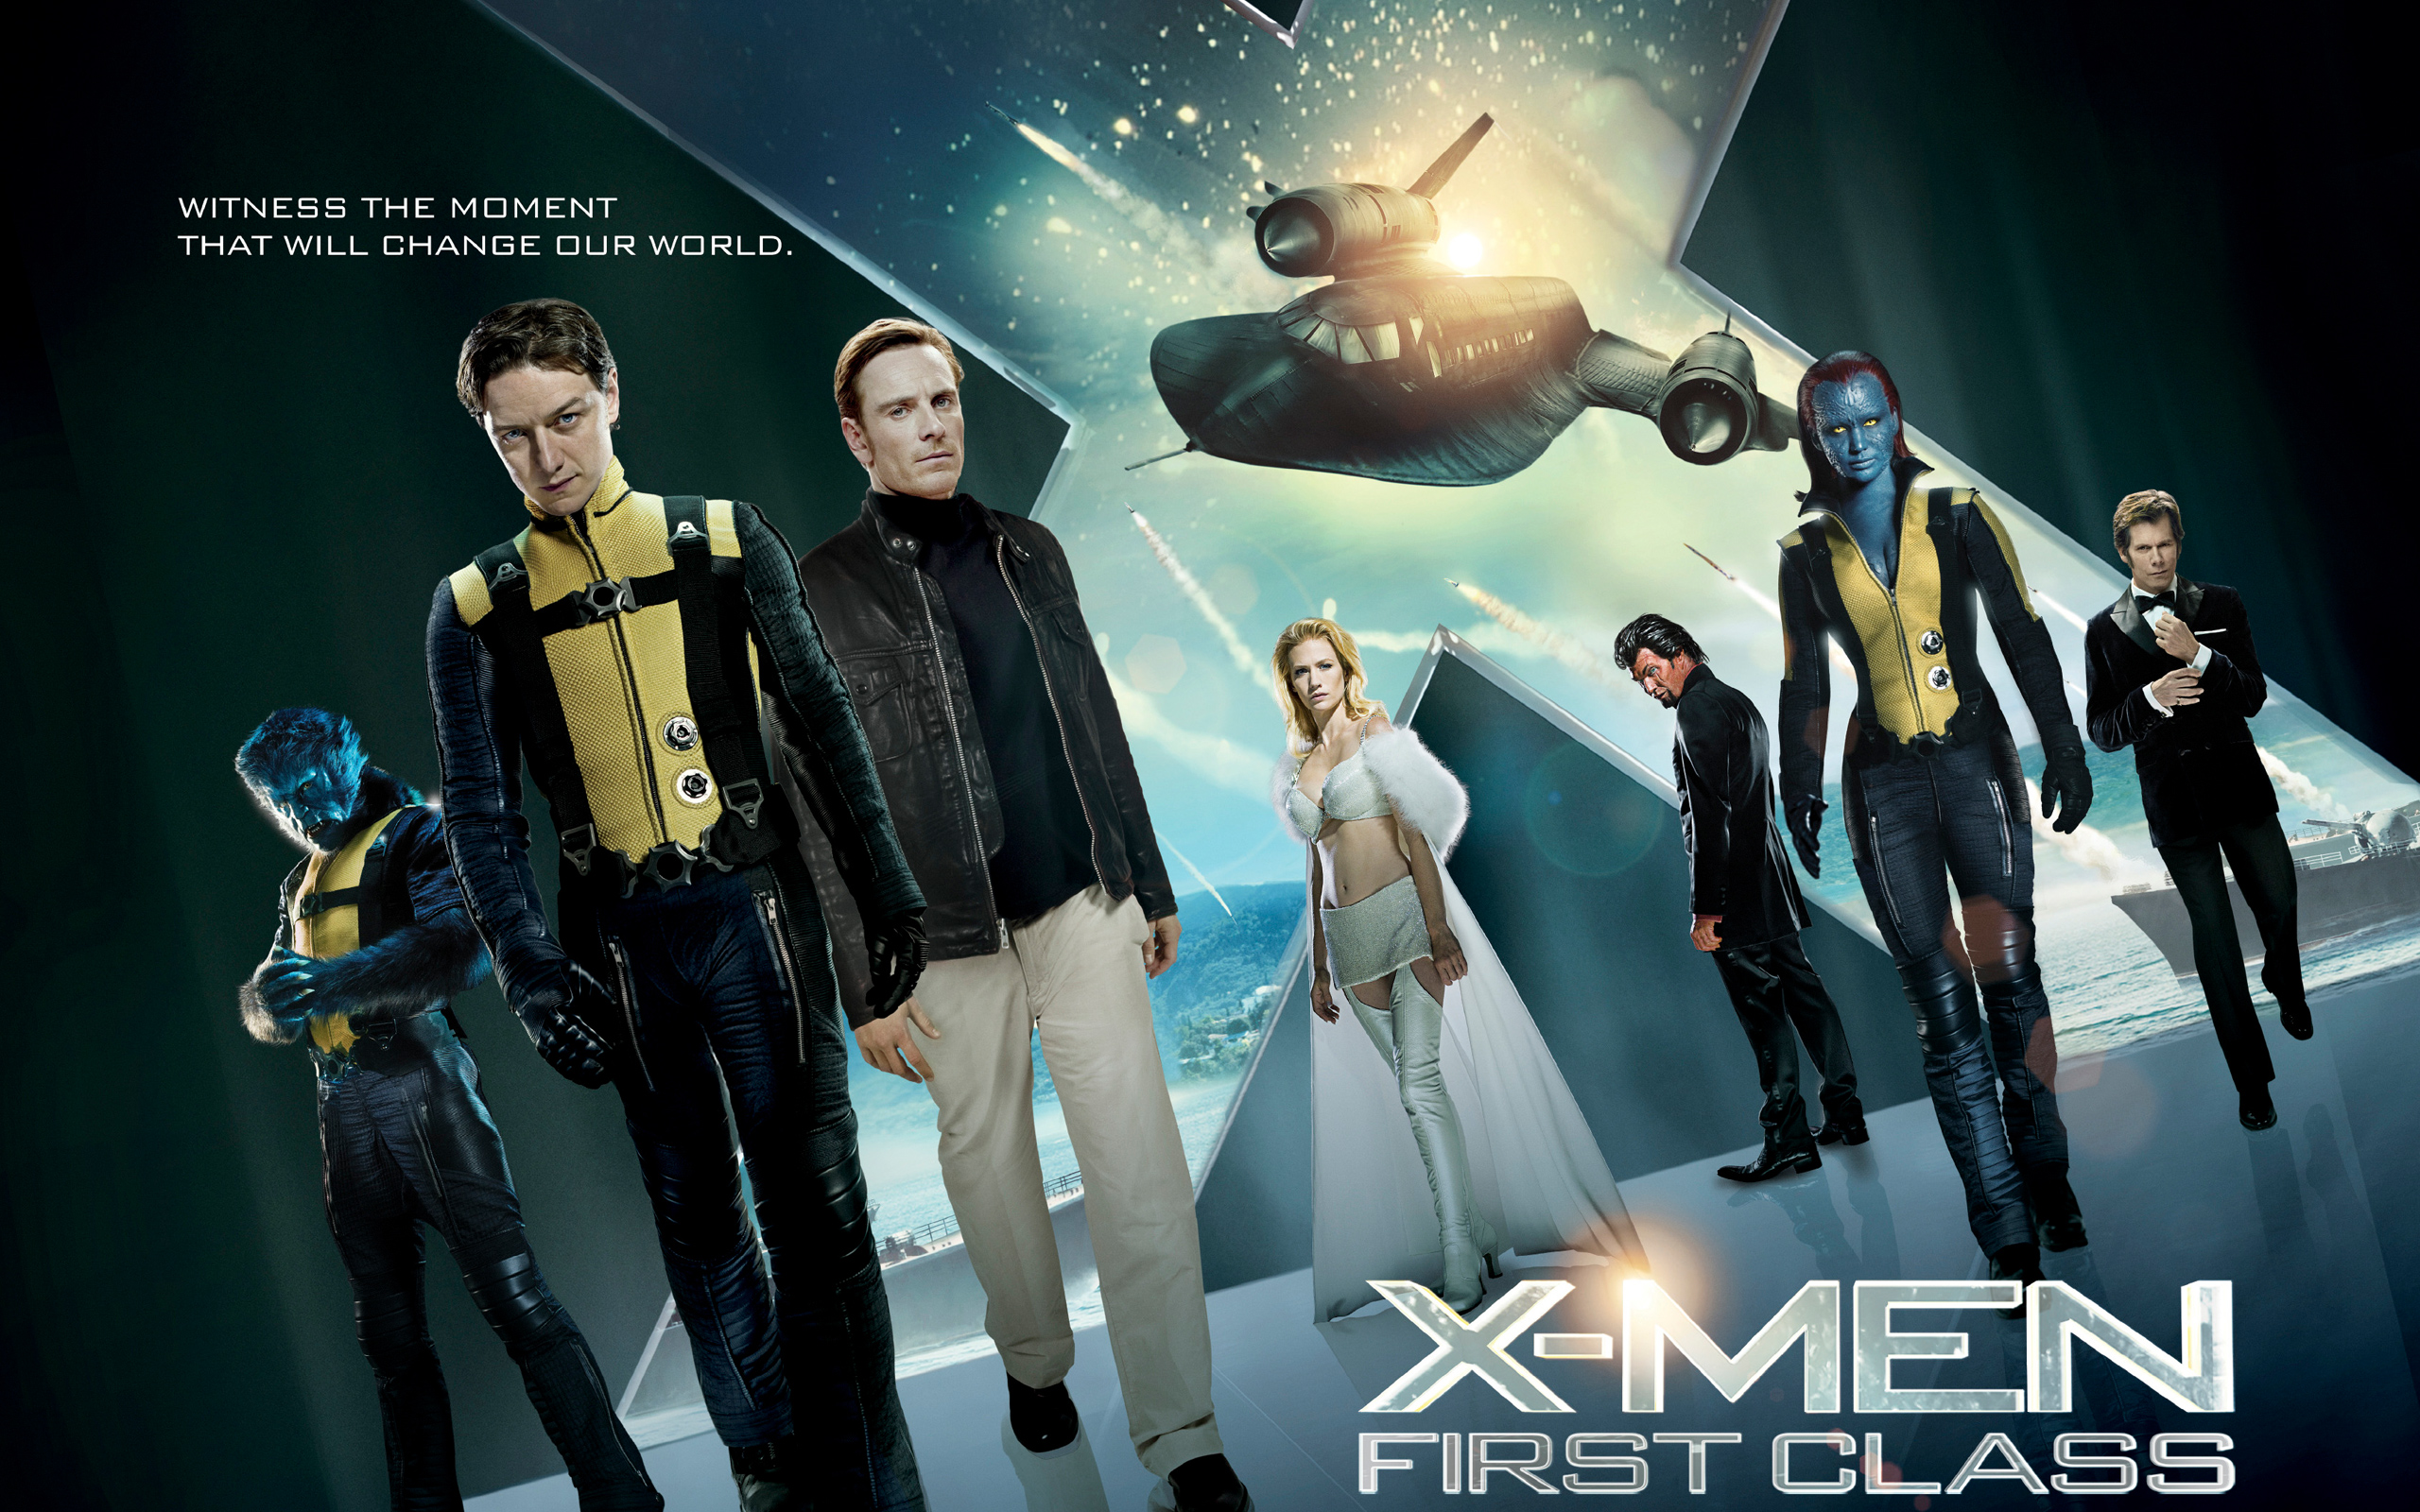 Men First Class 2011 Movie Wallpapers HD Wallpapers 2560x1600